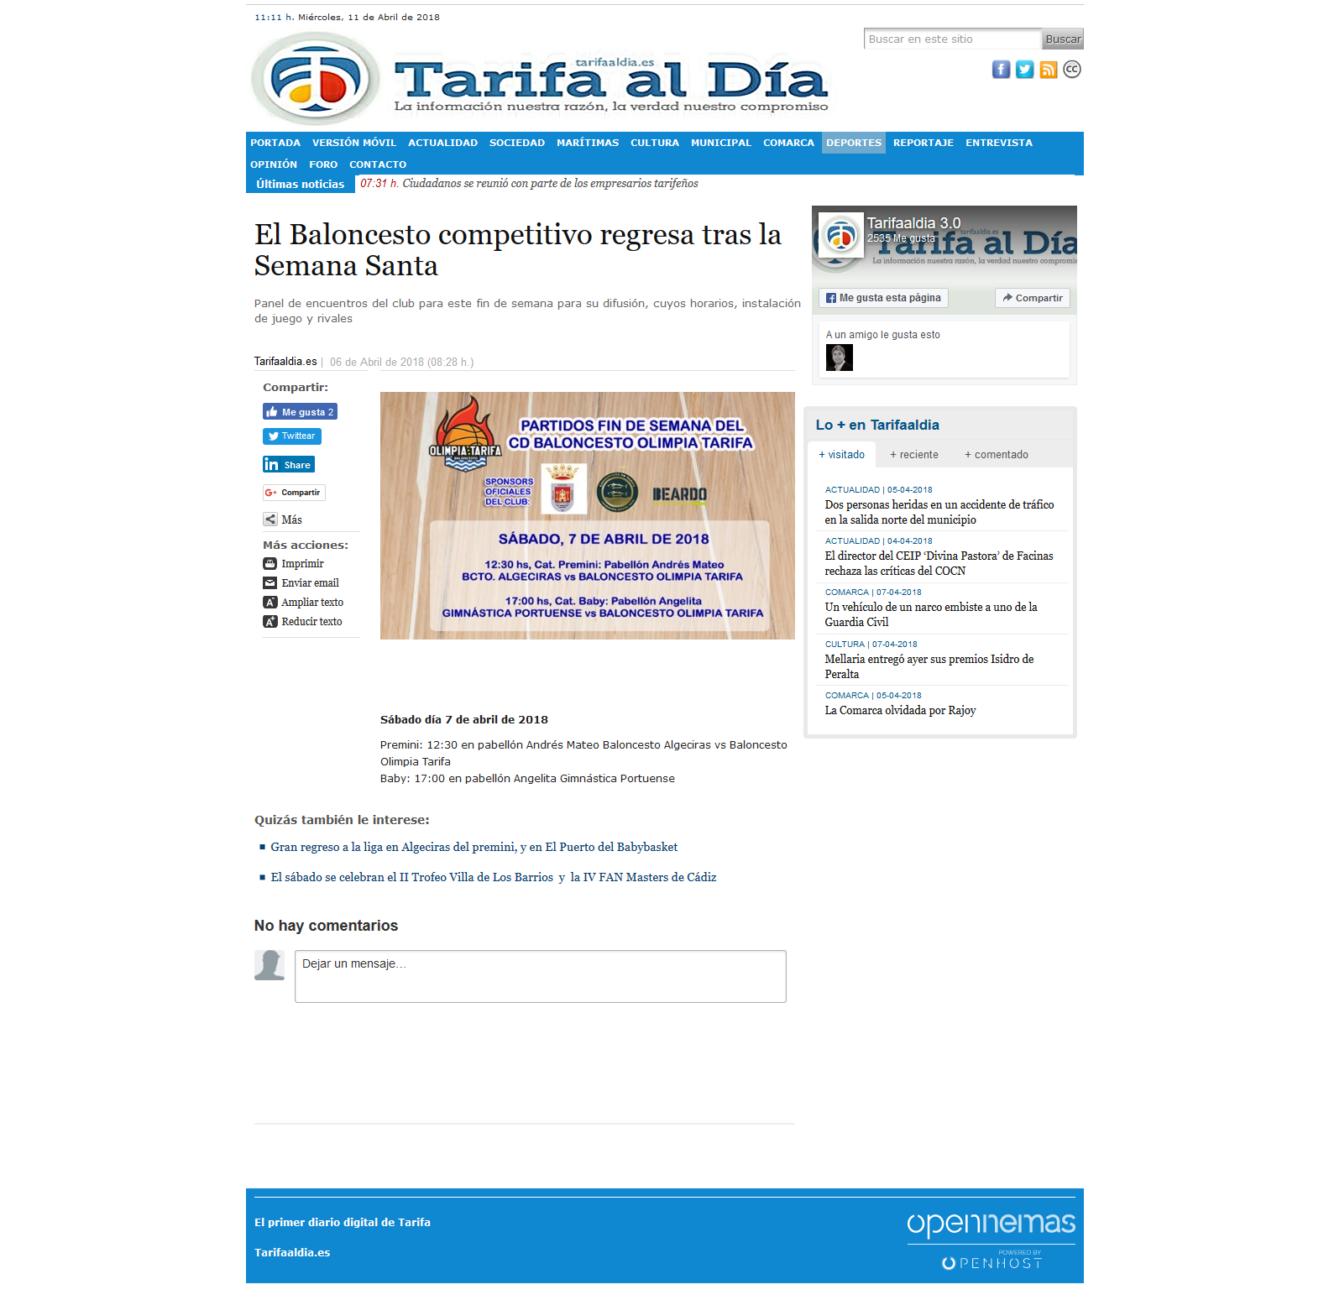 Screenshot-2018-4-11 El Baloncesto competitivo regresa tras la Semana Santa